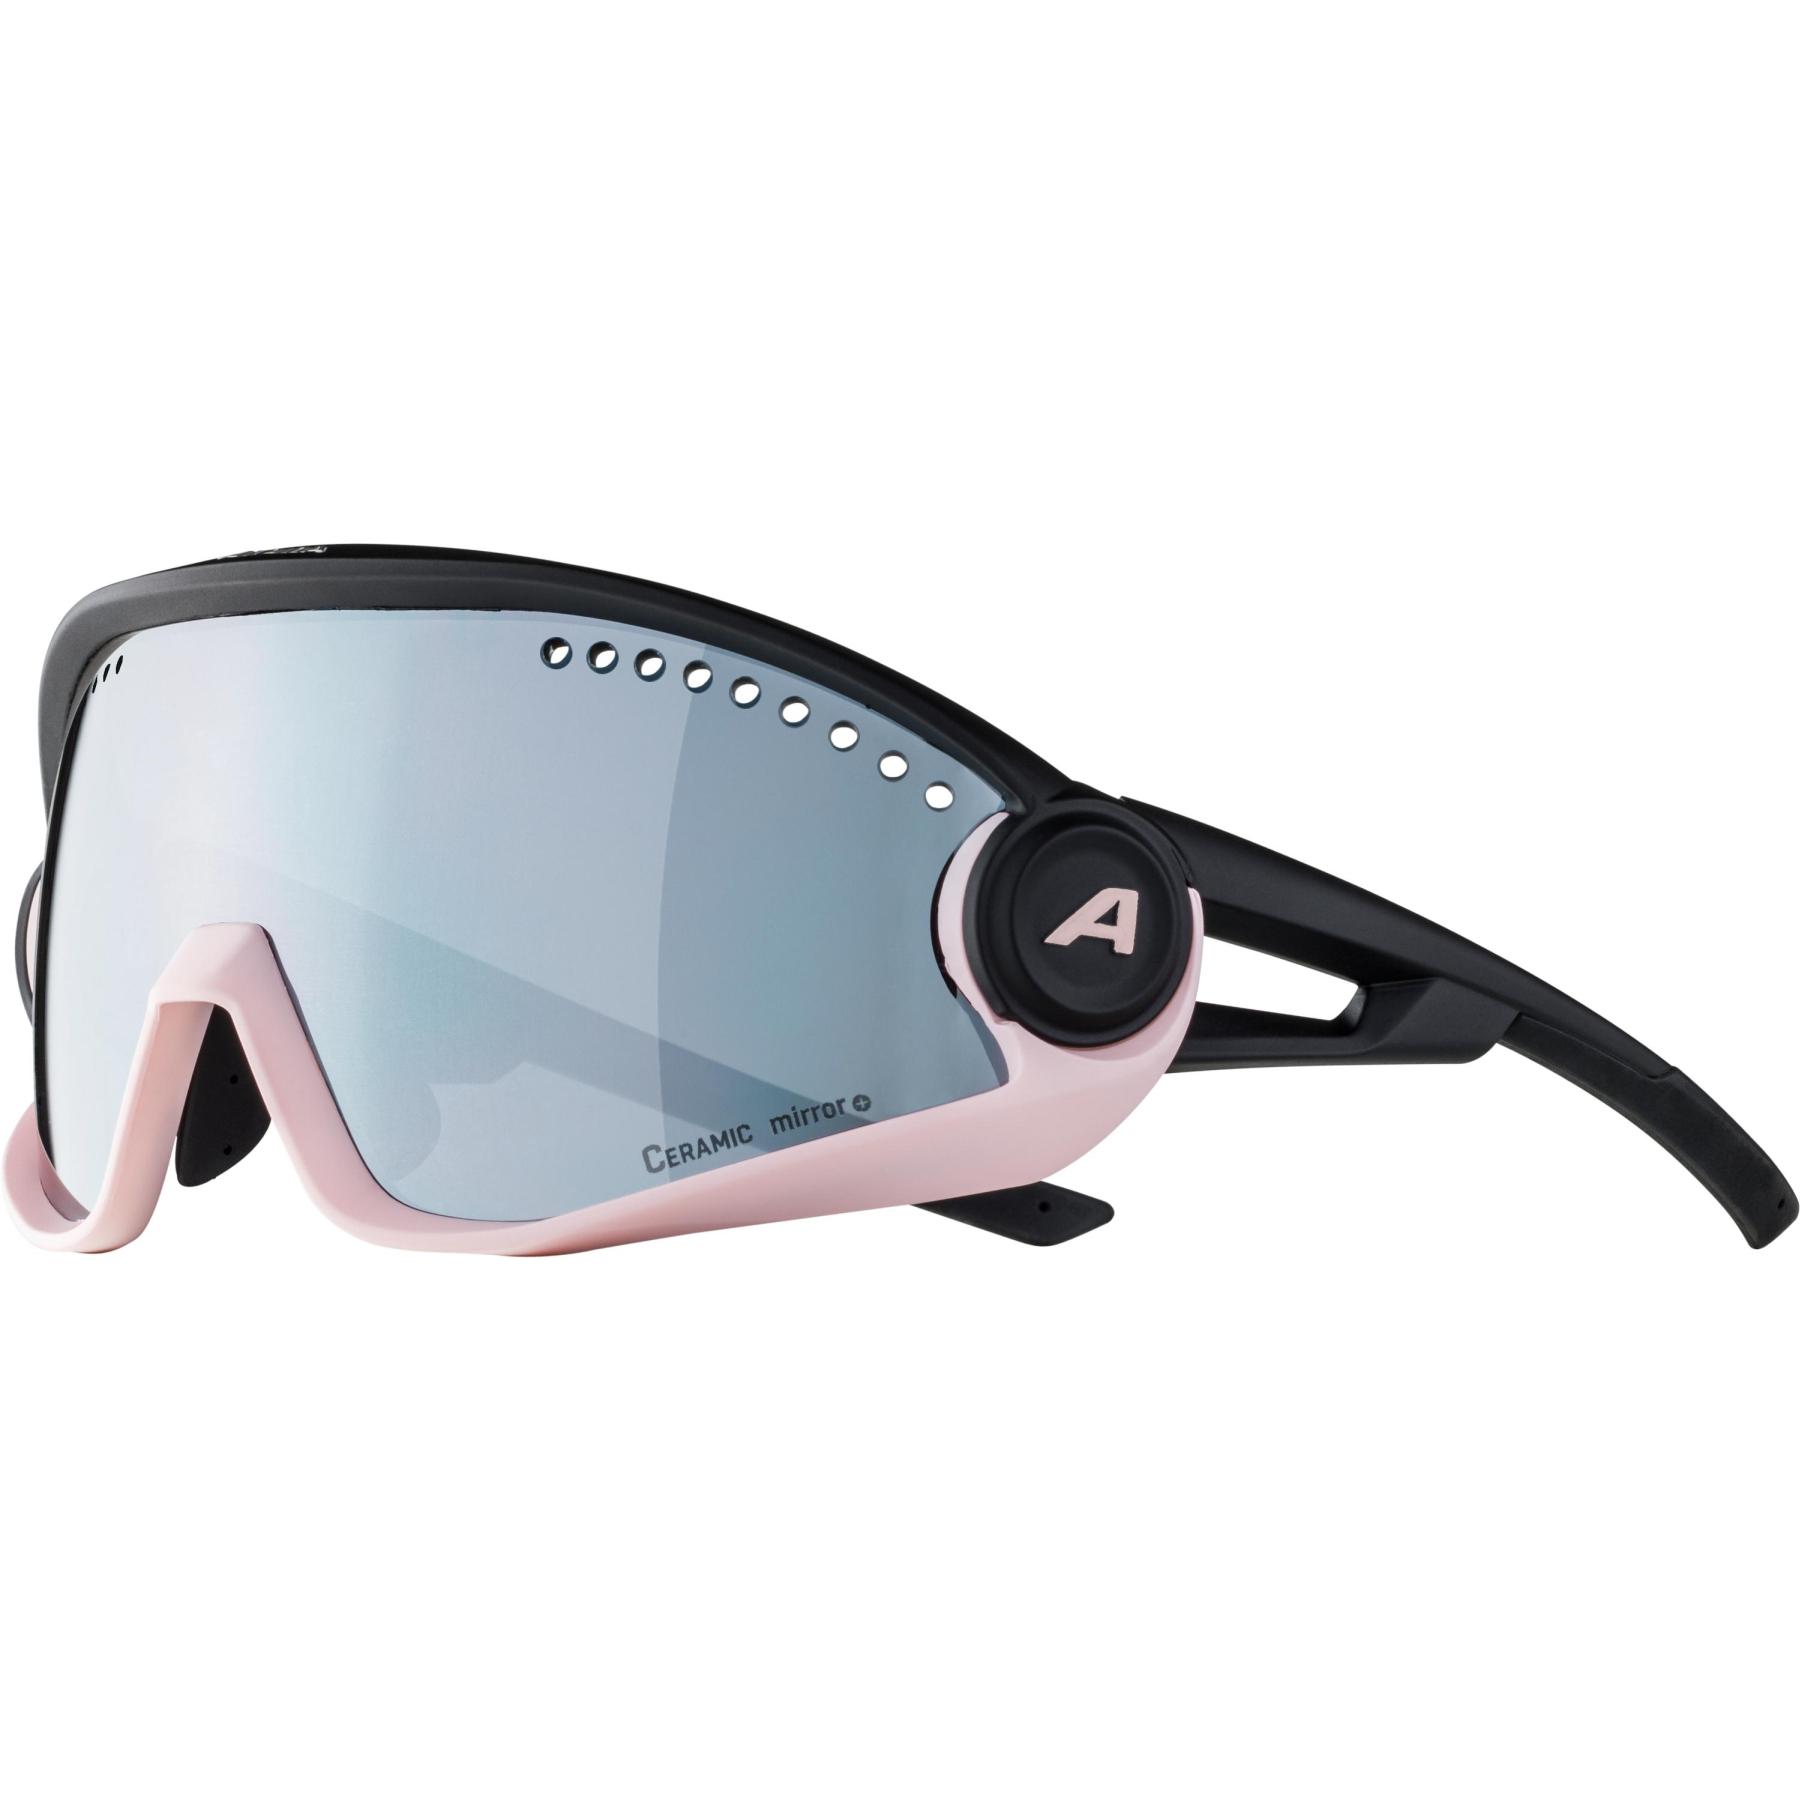 Image of Alpina 5W1NG CM+ Glasses - light-rose black / black mirror